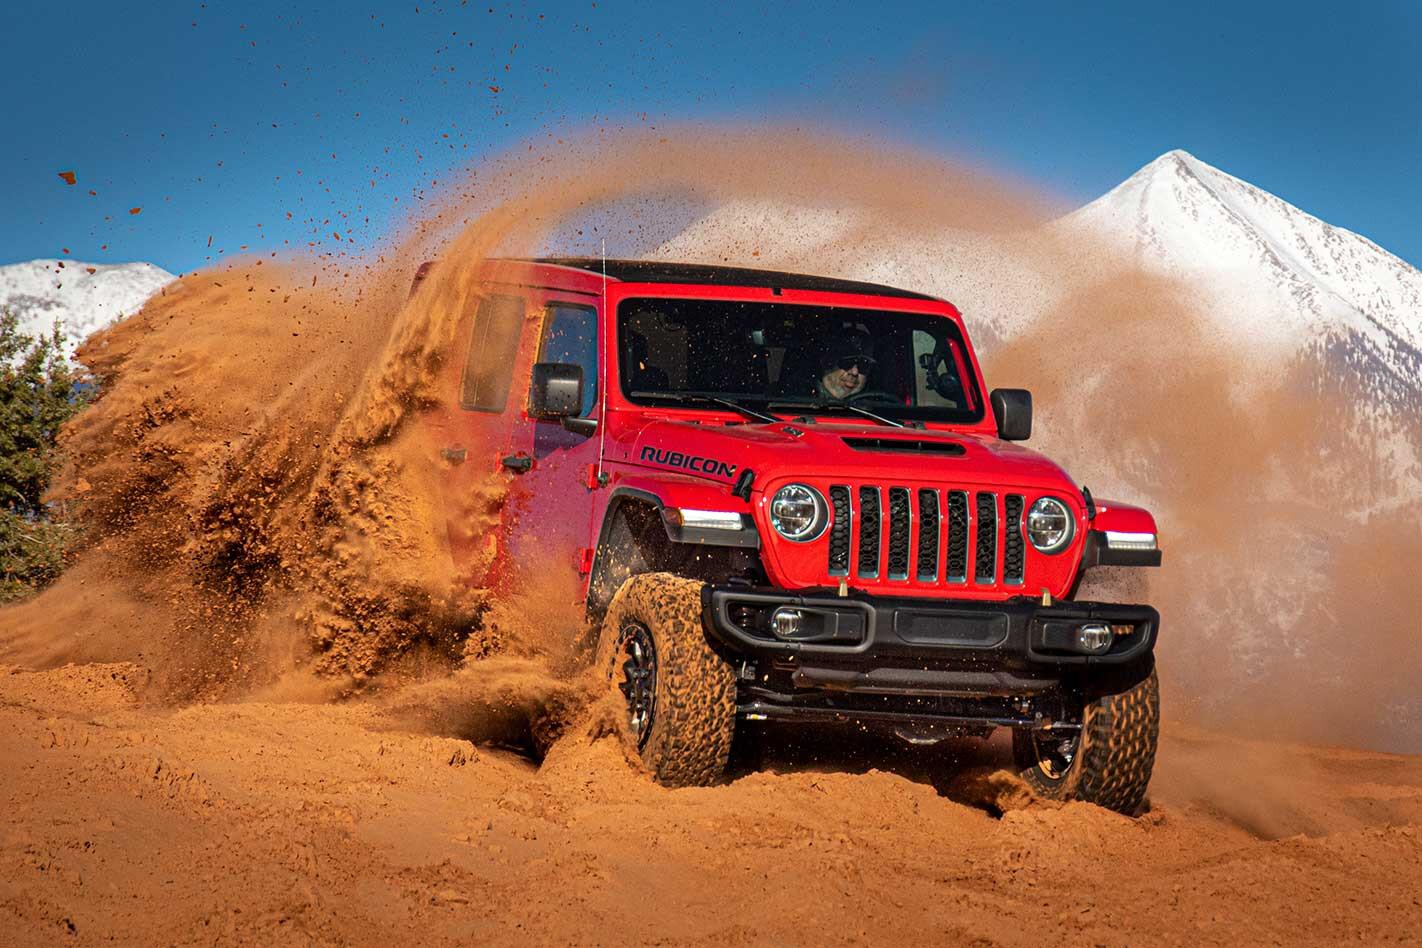 2021 Jeep Wrangler Rubicon 392 review